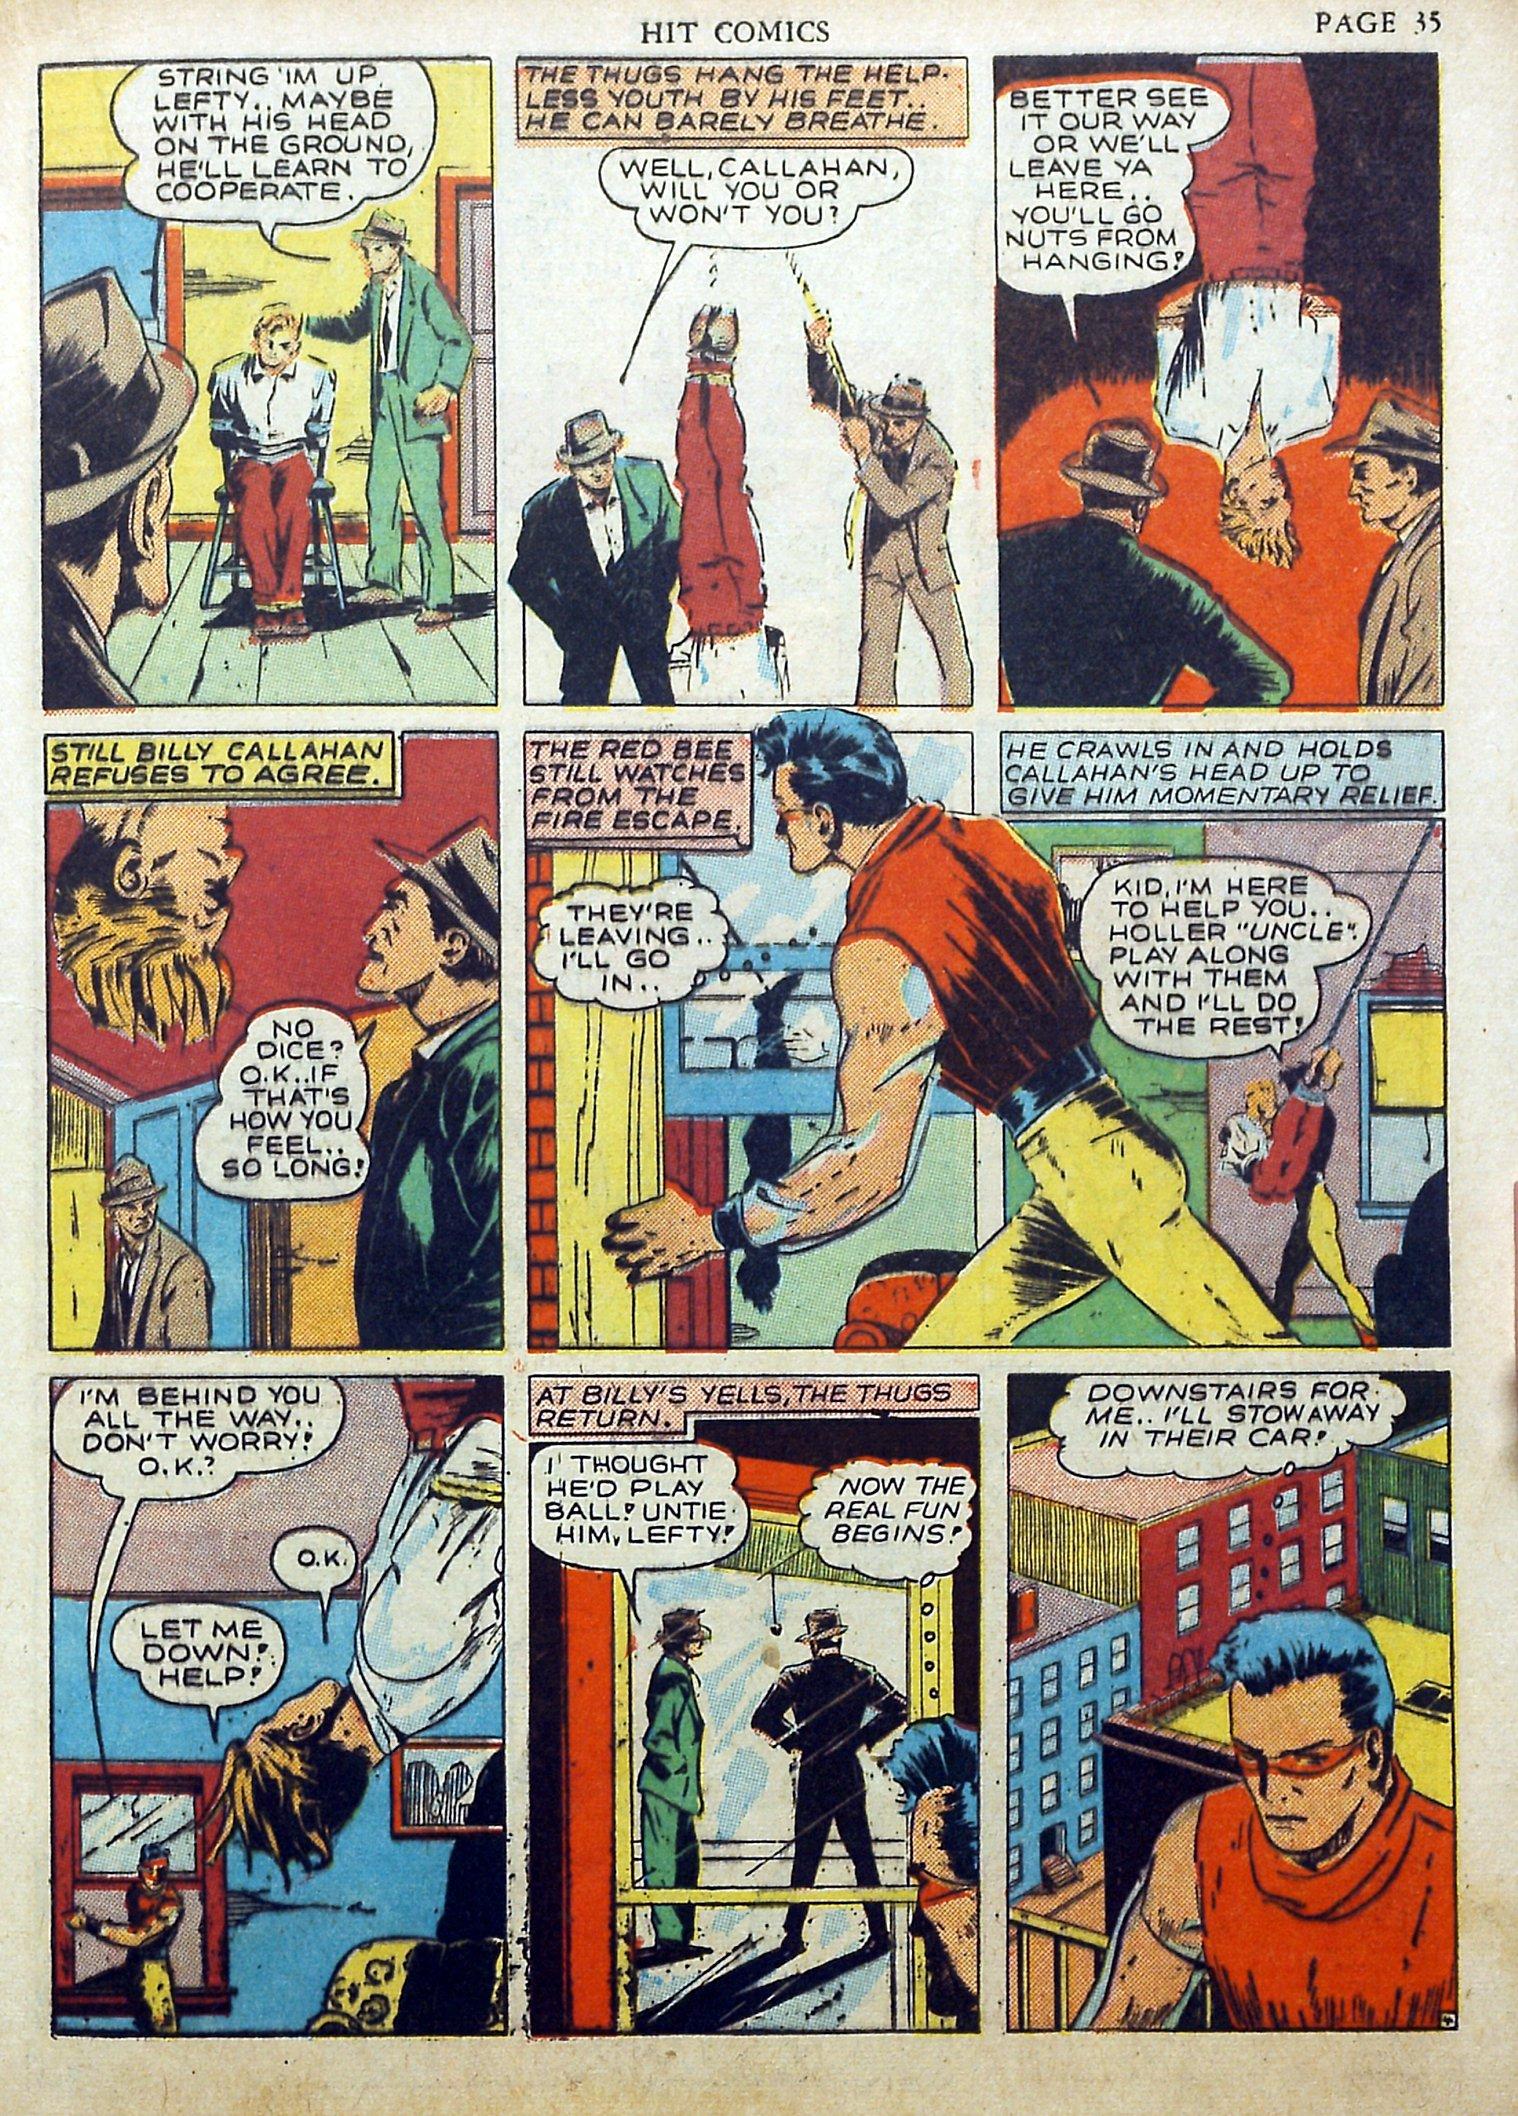 Read online Hit Comics comic -  Issue #17 - 37